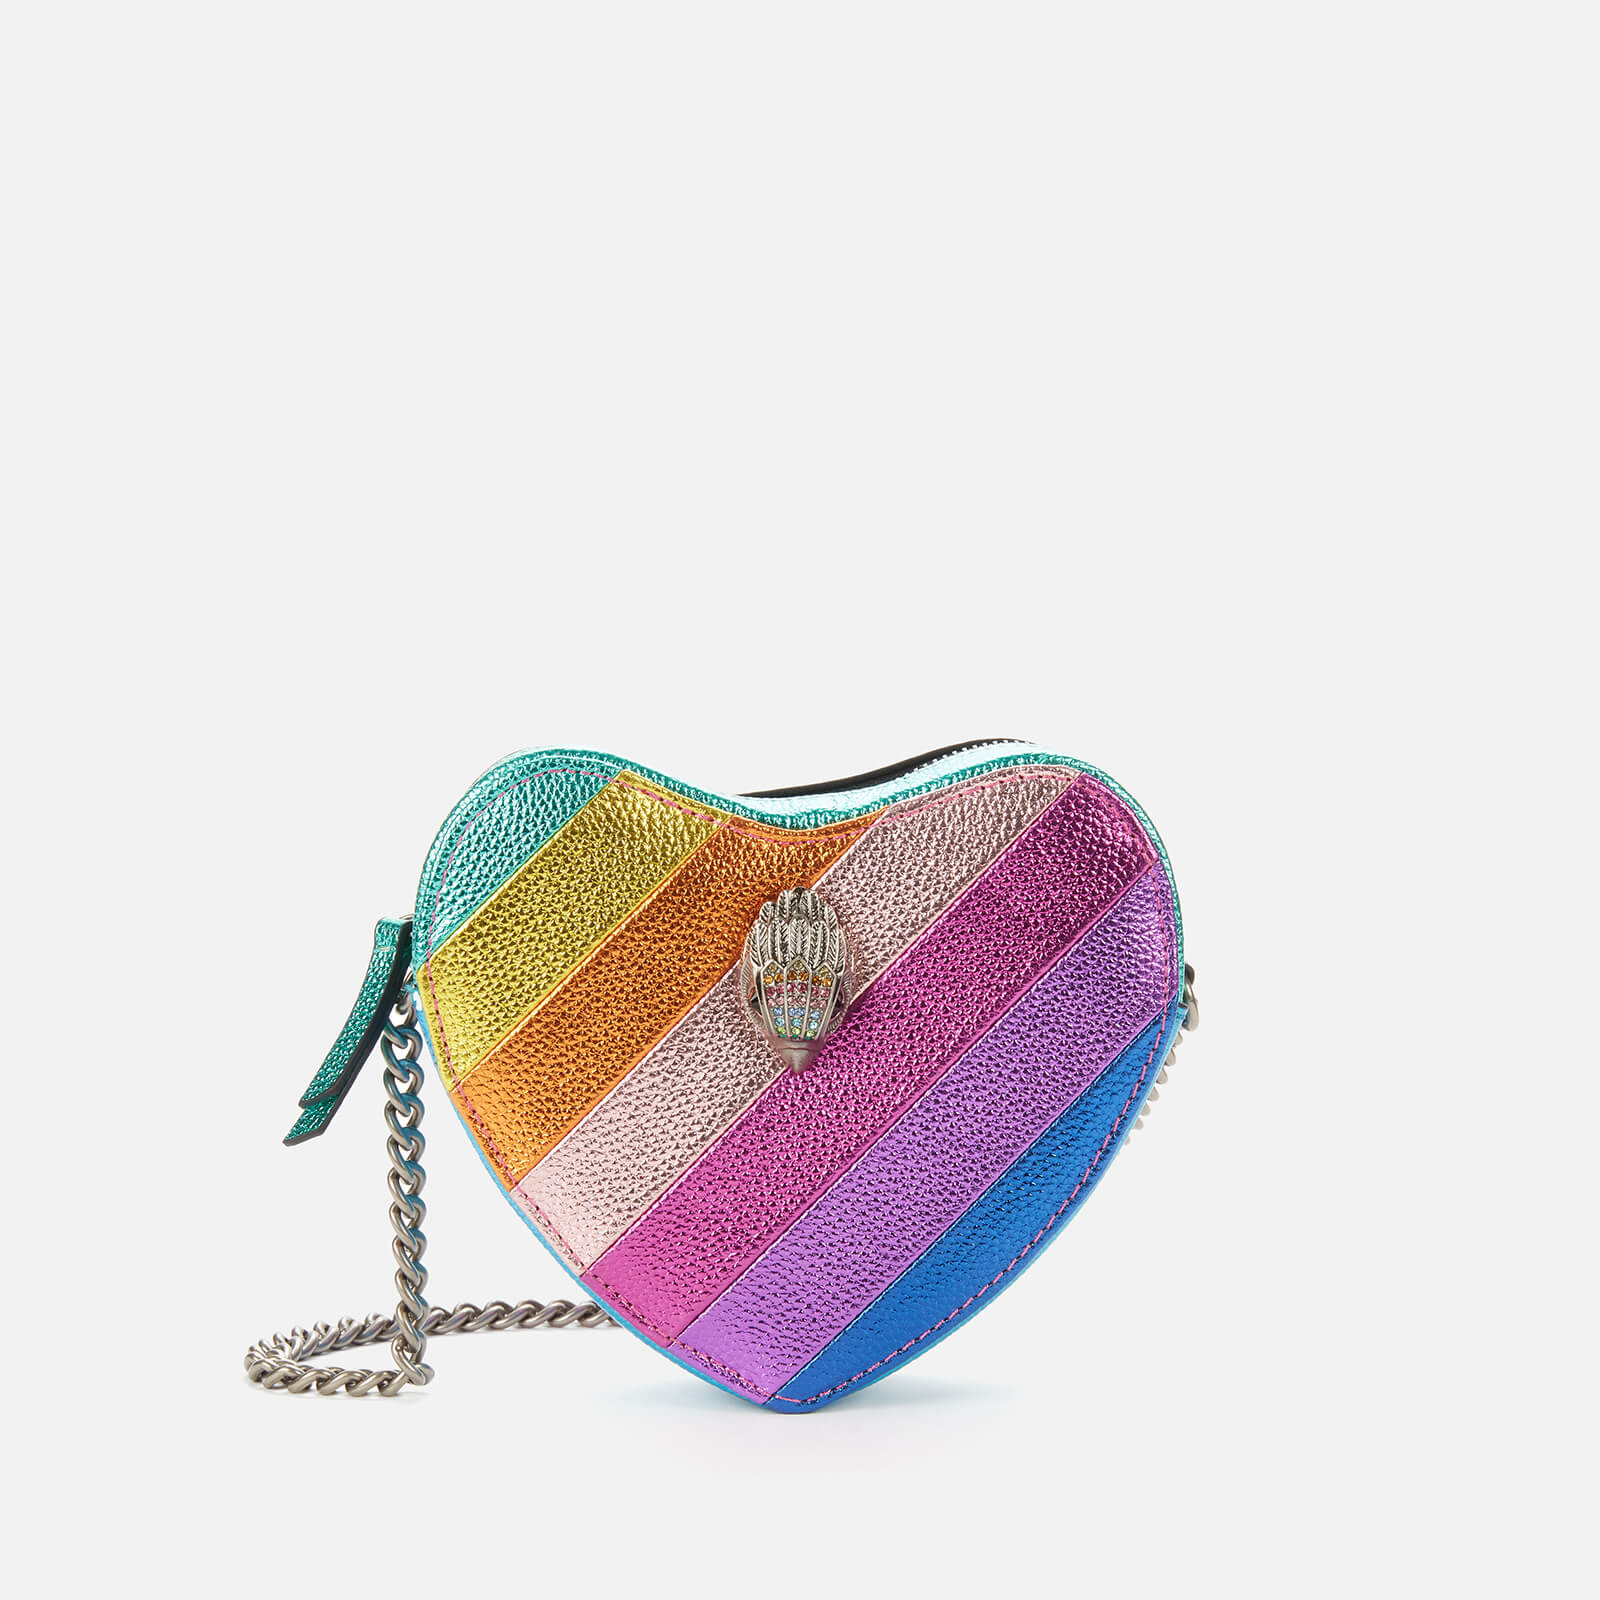 Kurt Geiger London Women's Kensington Metallic Heart Cross Body Bag - Multi